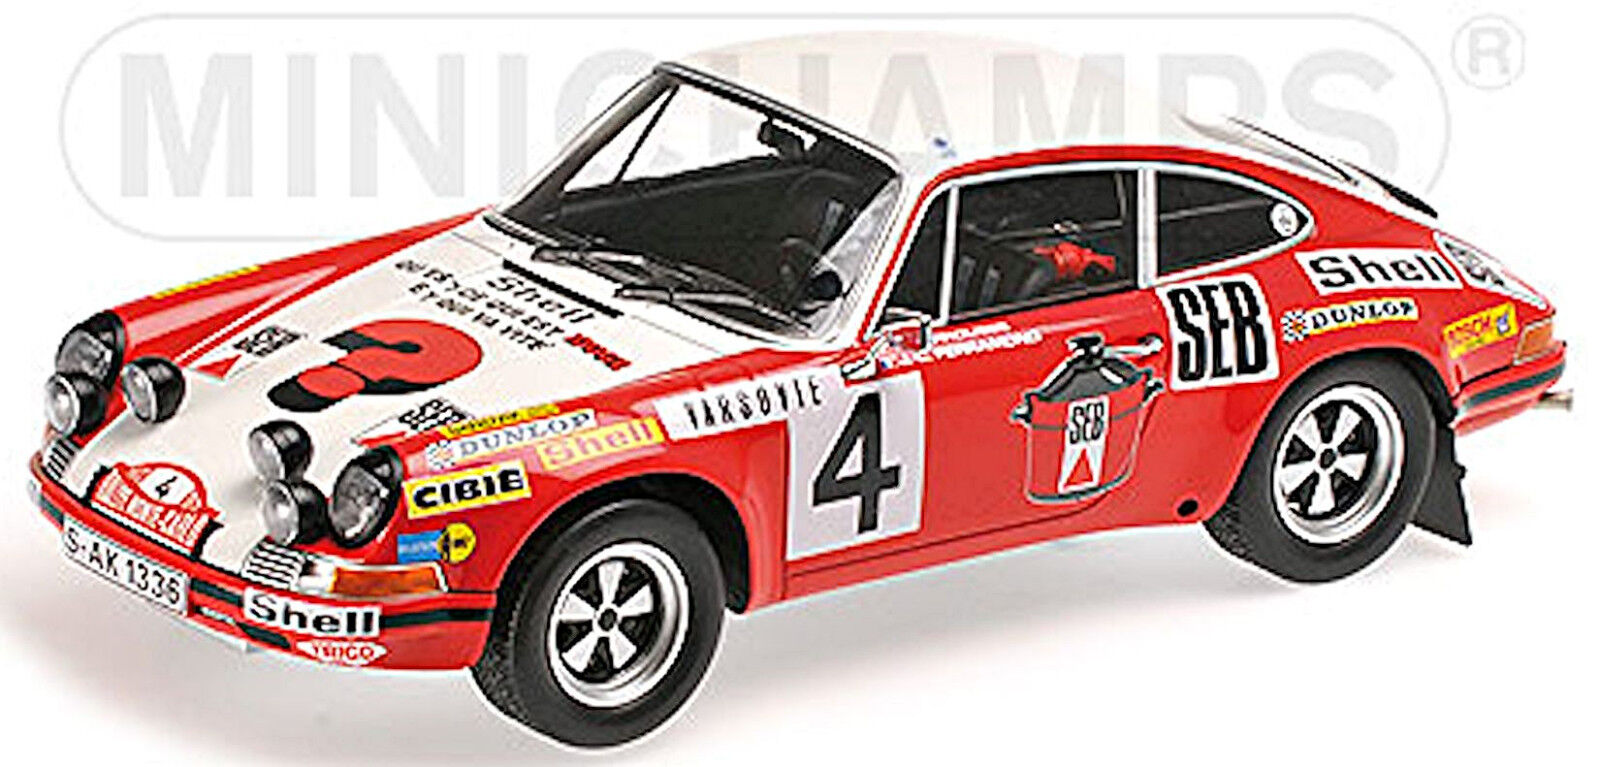 Porsche 911 s 2nd place rallye monte carlo 1972 Larousse 1 18 MINICHAMPS